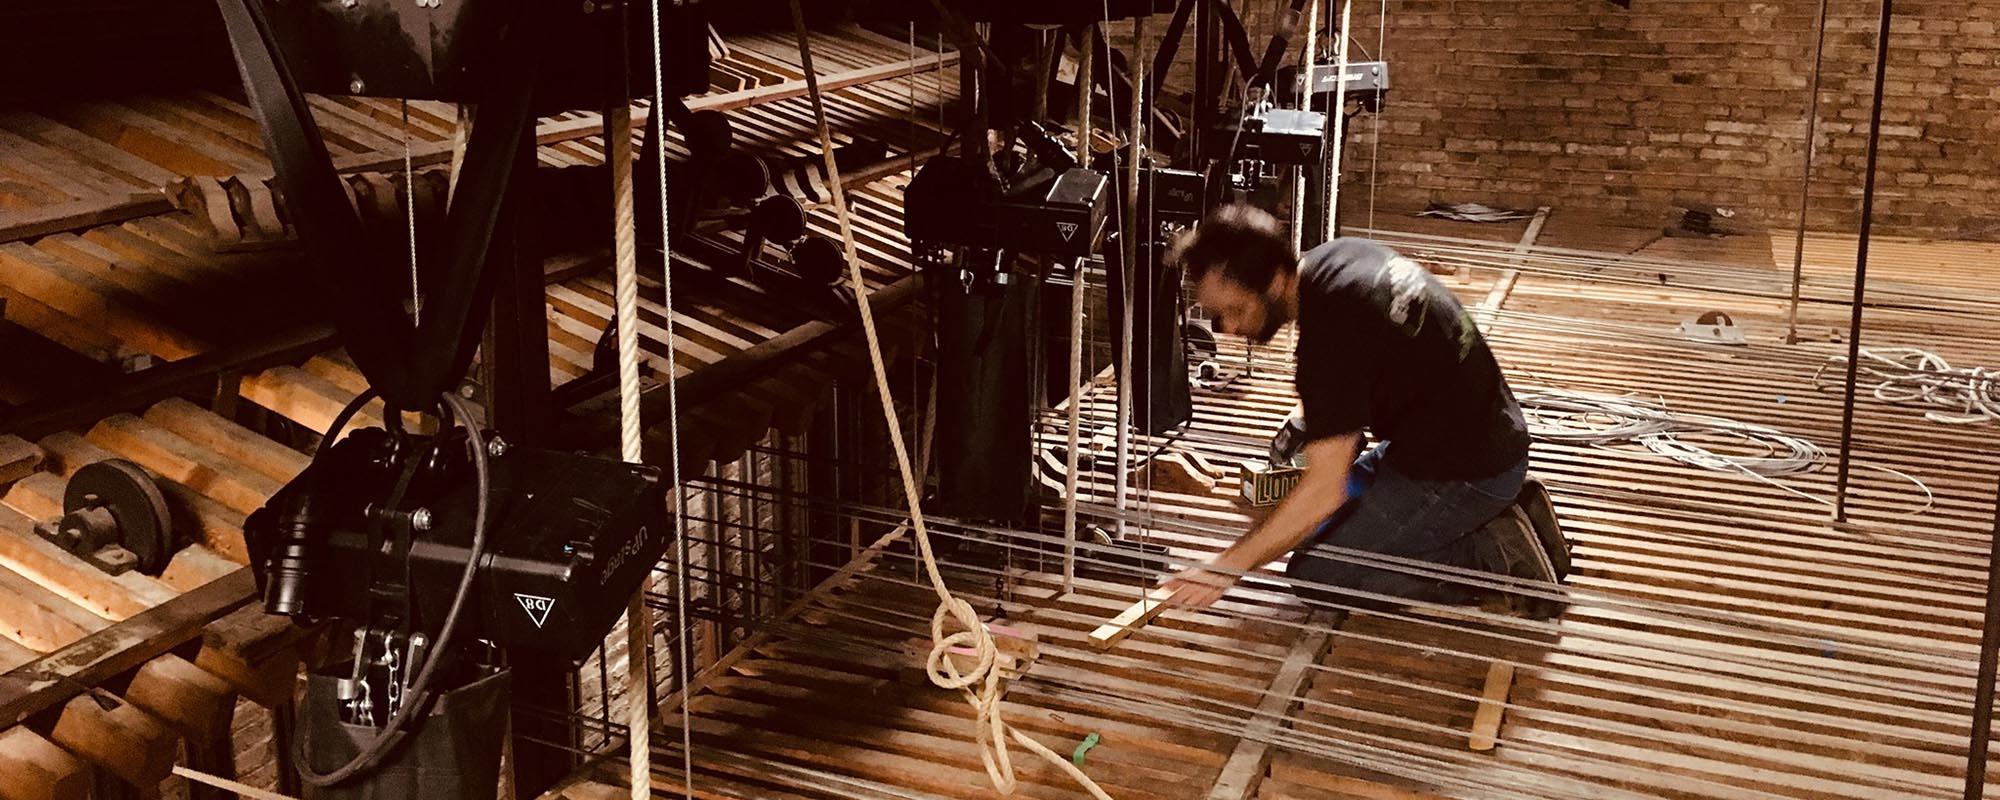 El Telar Rigging alquiler rigging teatral